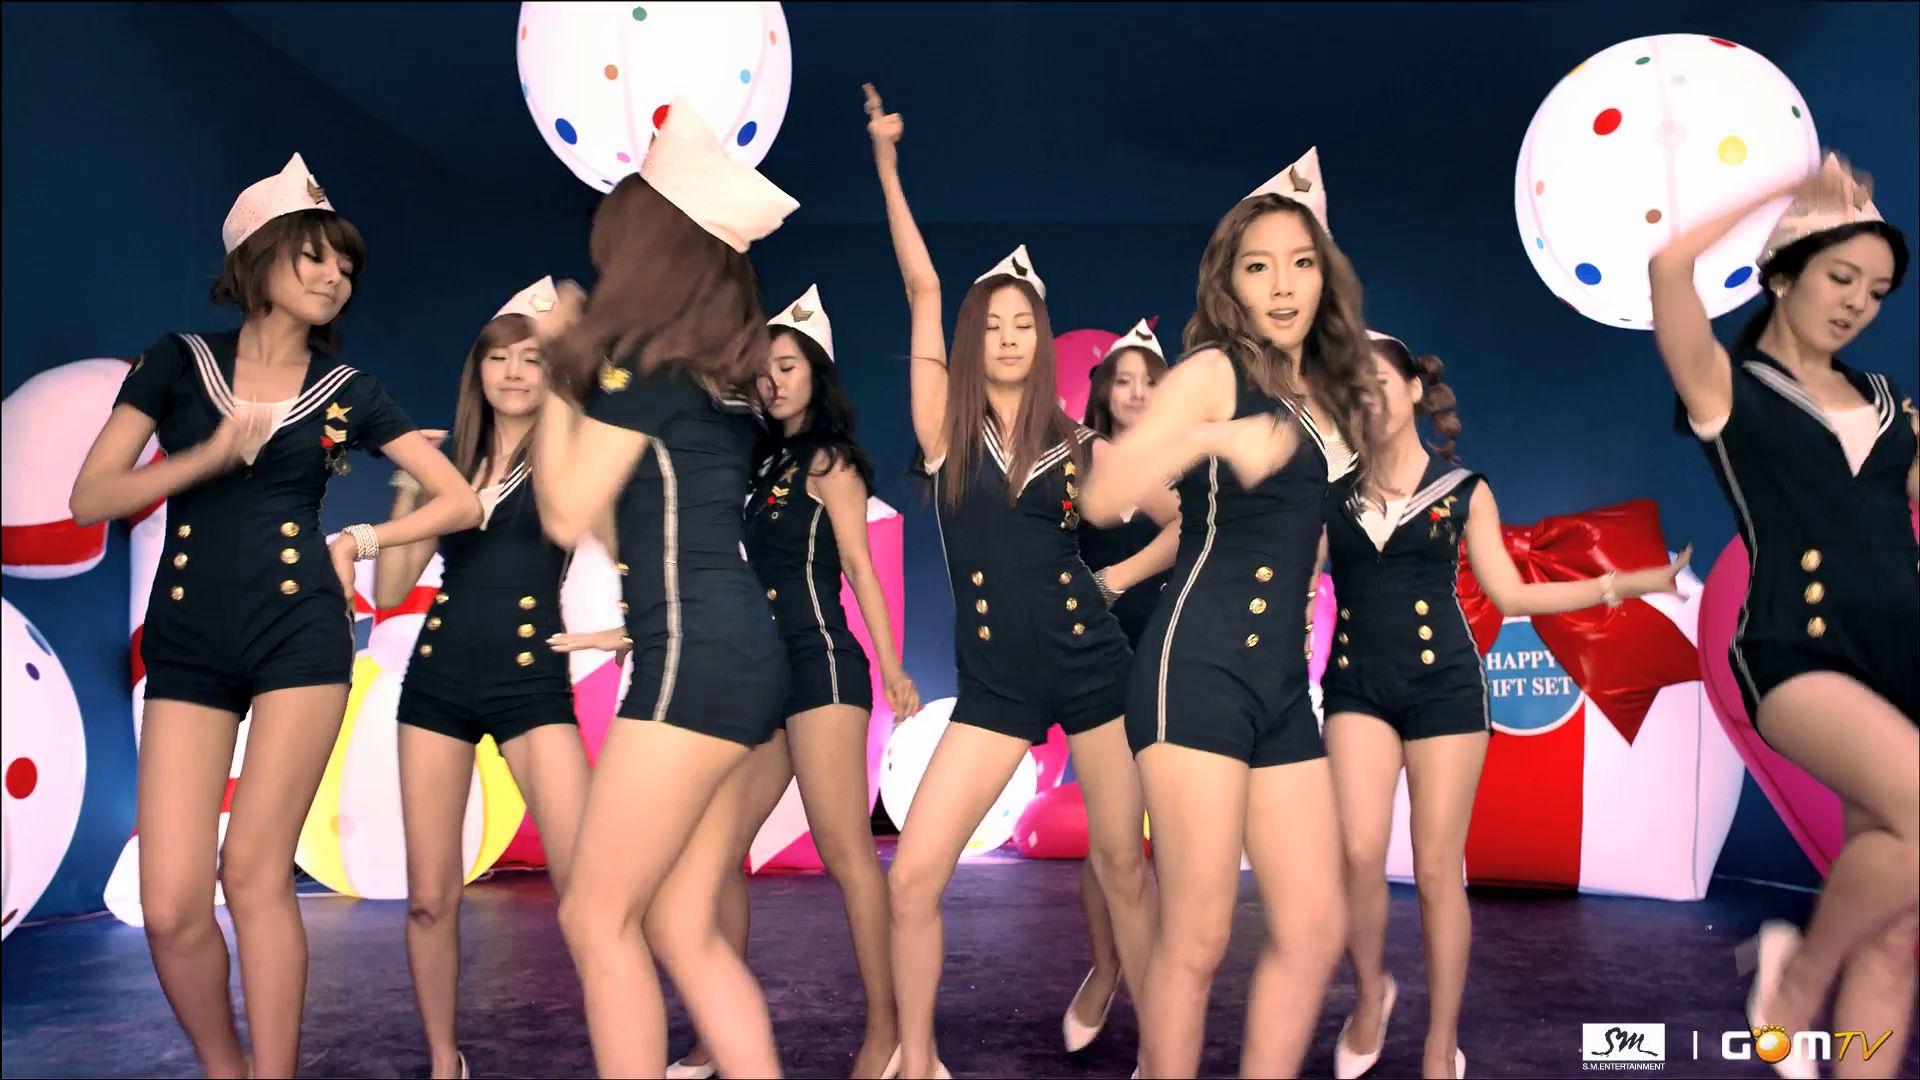 Girls' Generation / SNSD Image Galleries: Music Videos